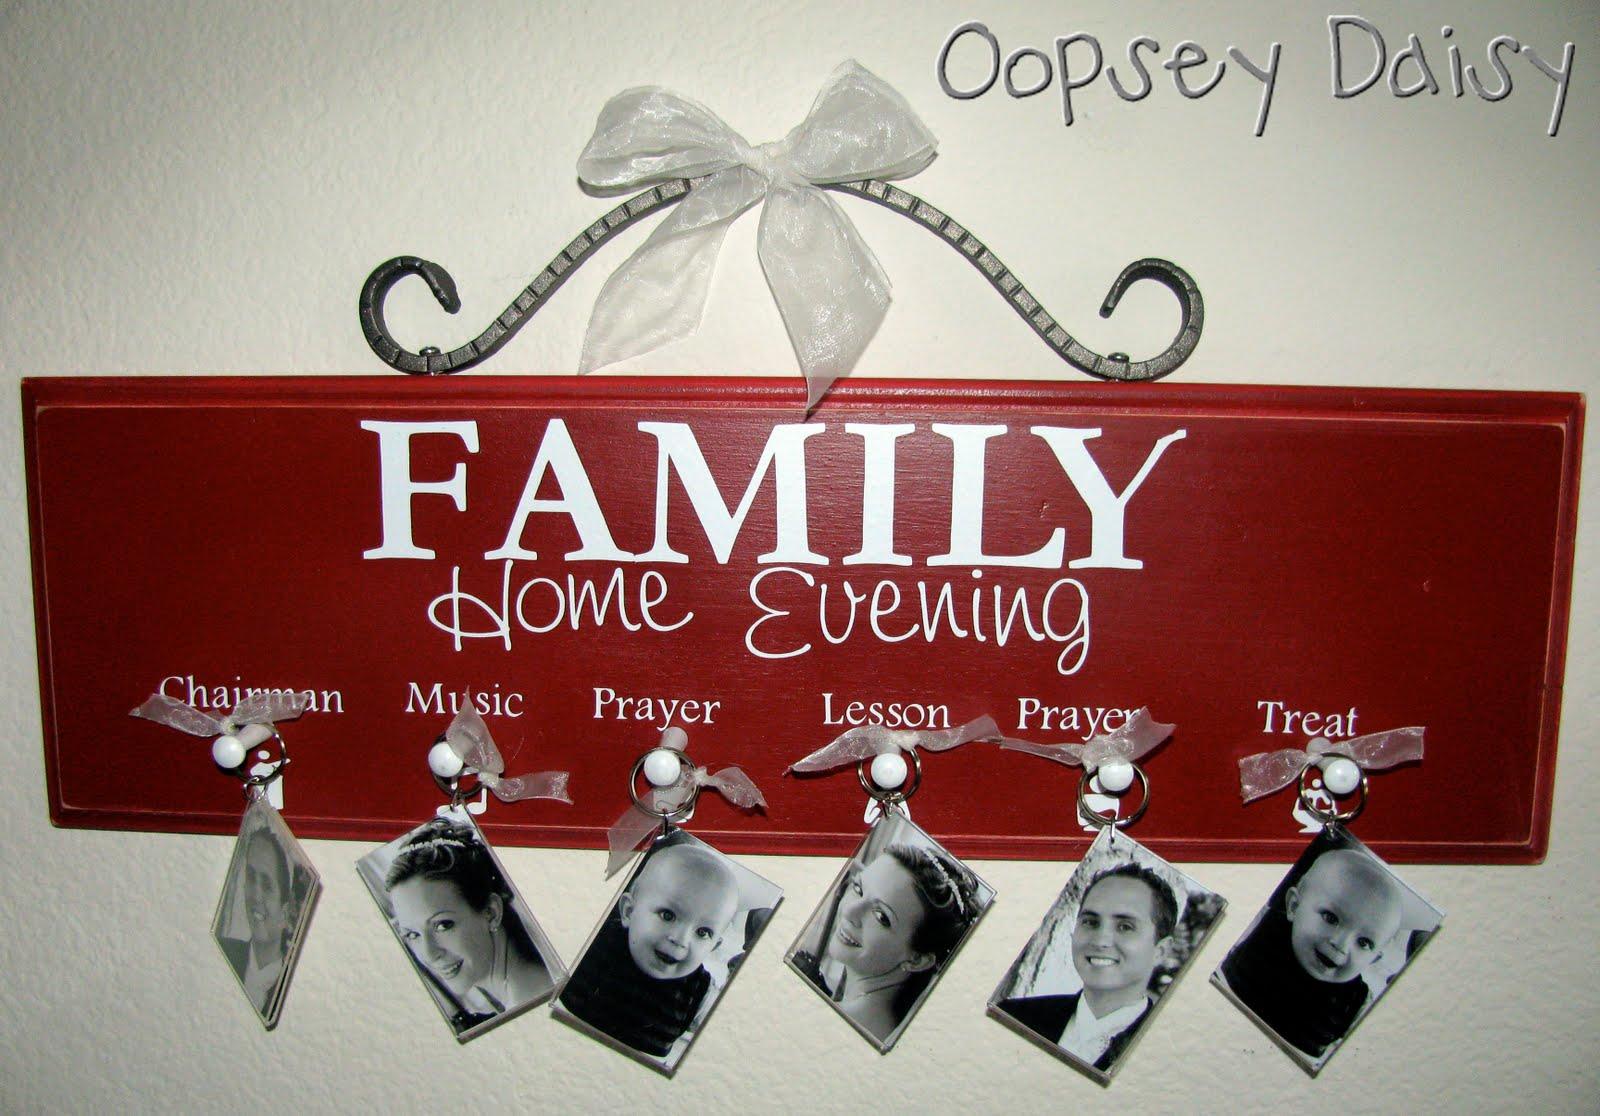 Fhe chart finally oopsey daisy for Idea door family home evening